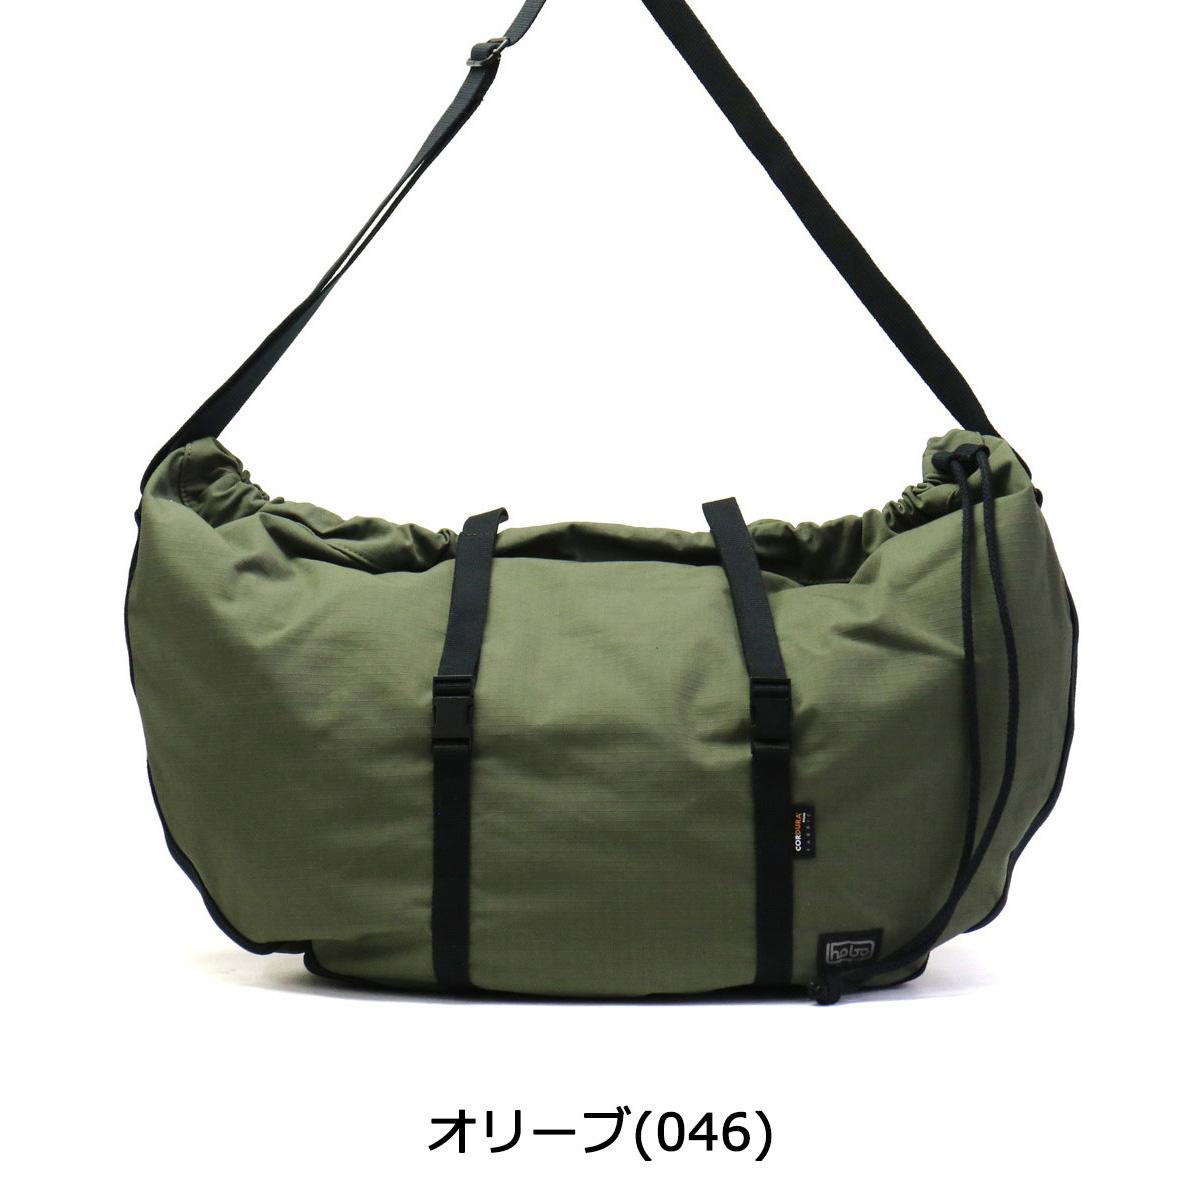 Hobo Shoulder Bag Cordura Cotton Nylon Ripstop Round Men S Women Casual Hb Bg 2727